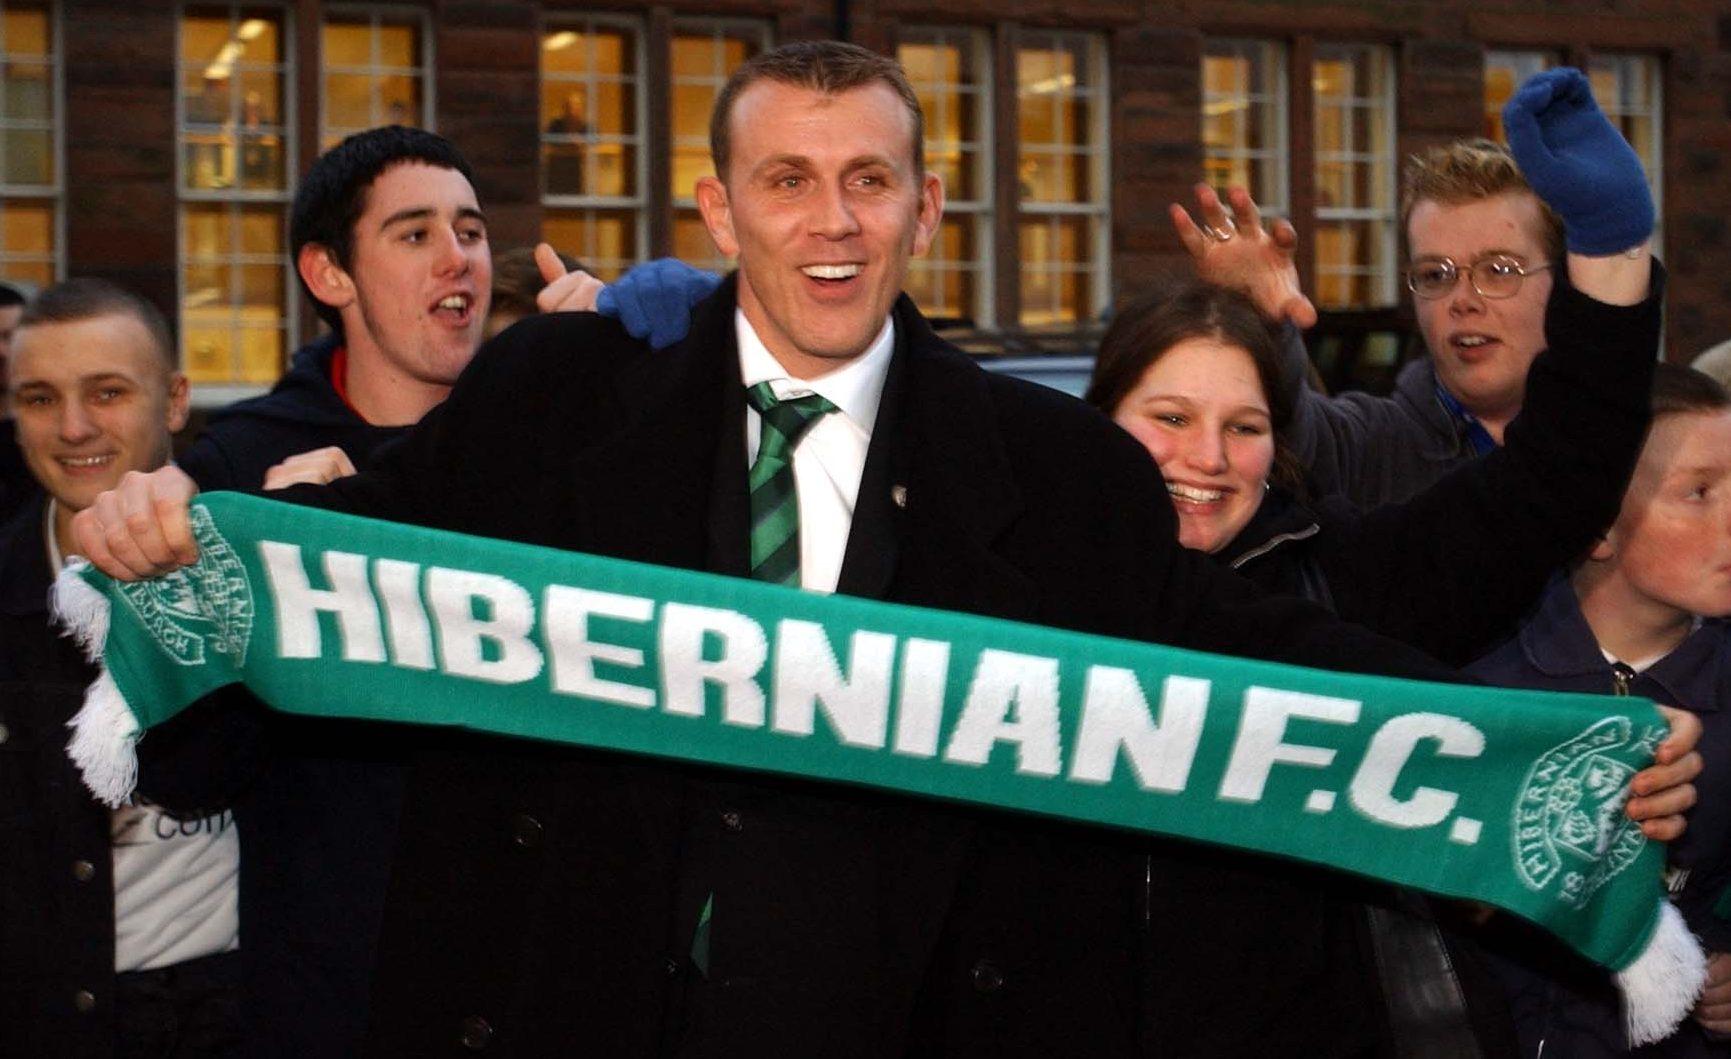 Remember this bloke, Hibs fans?